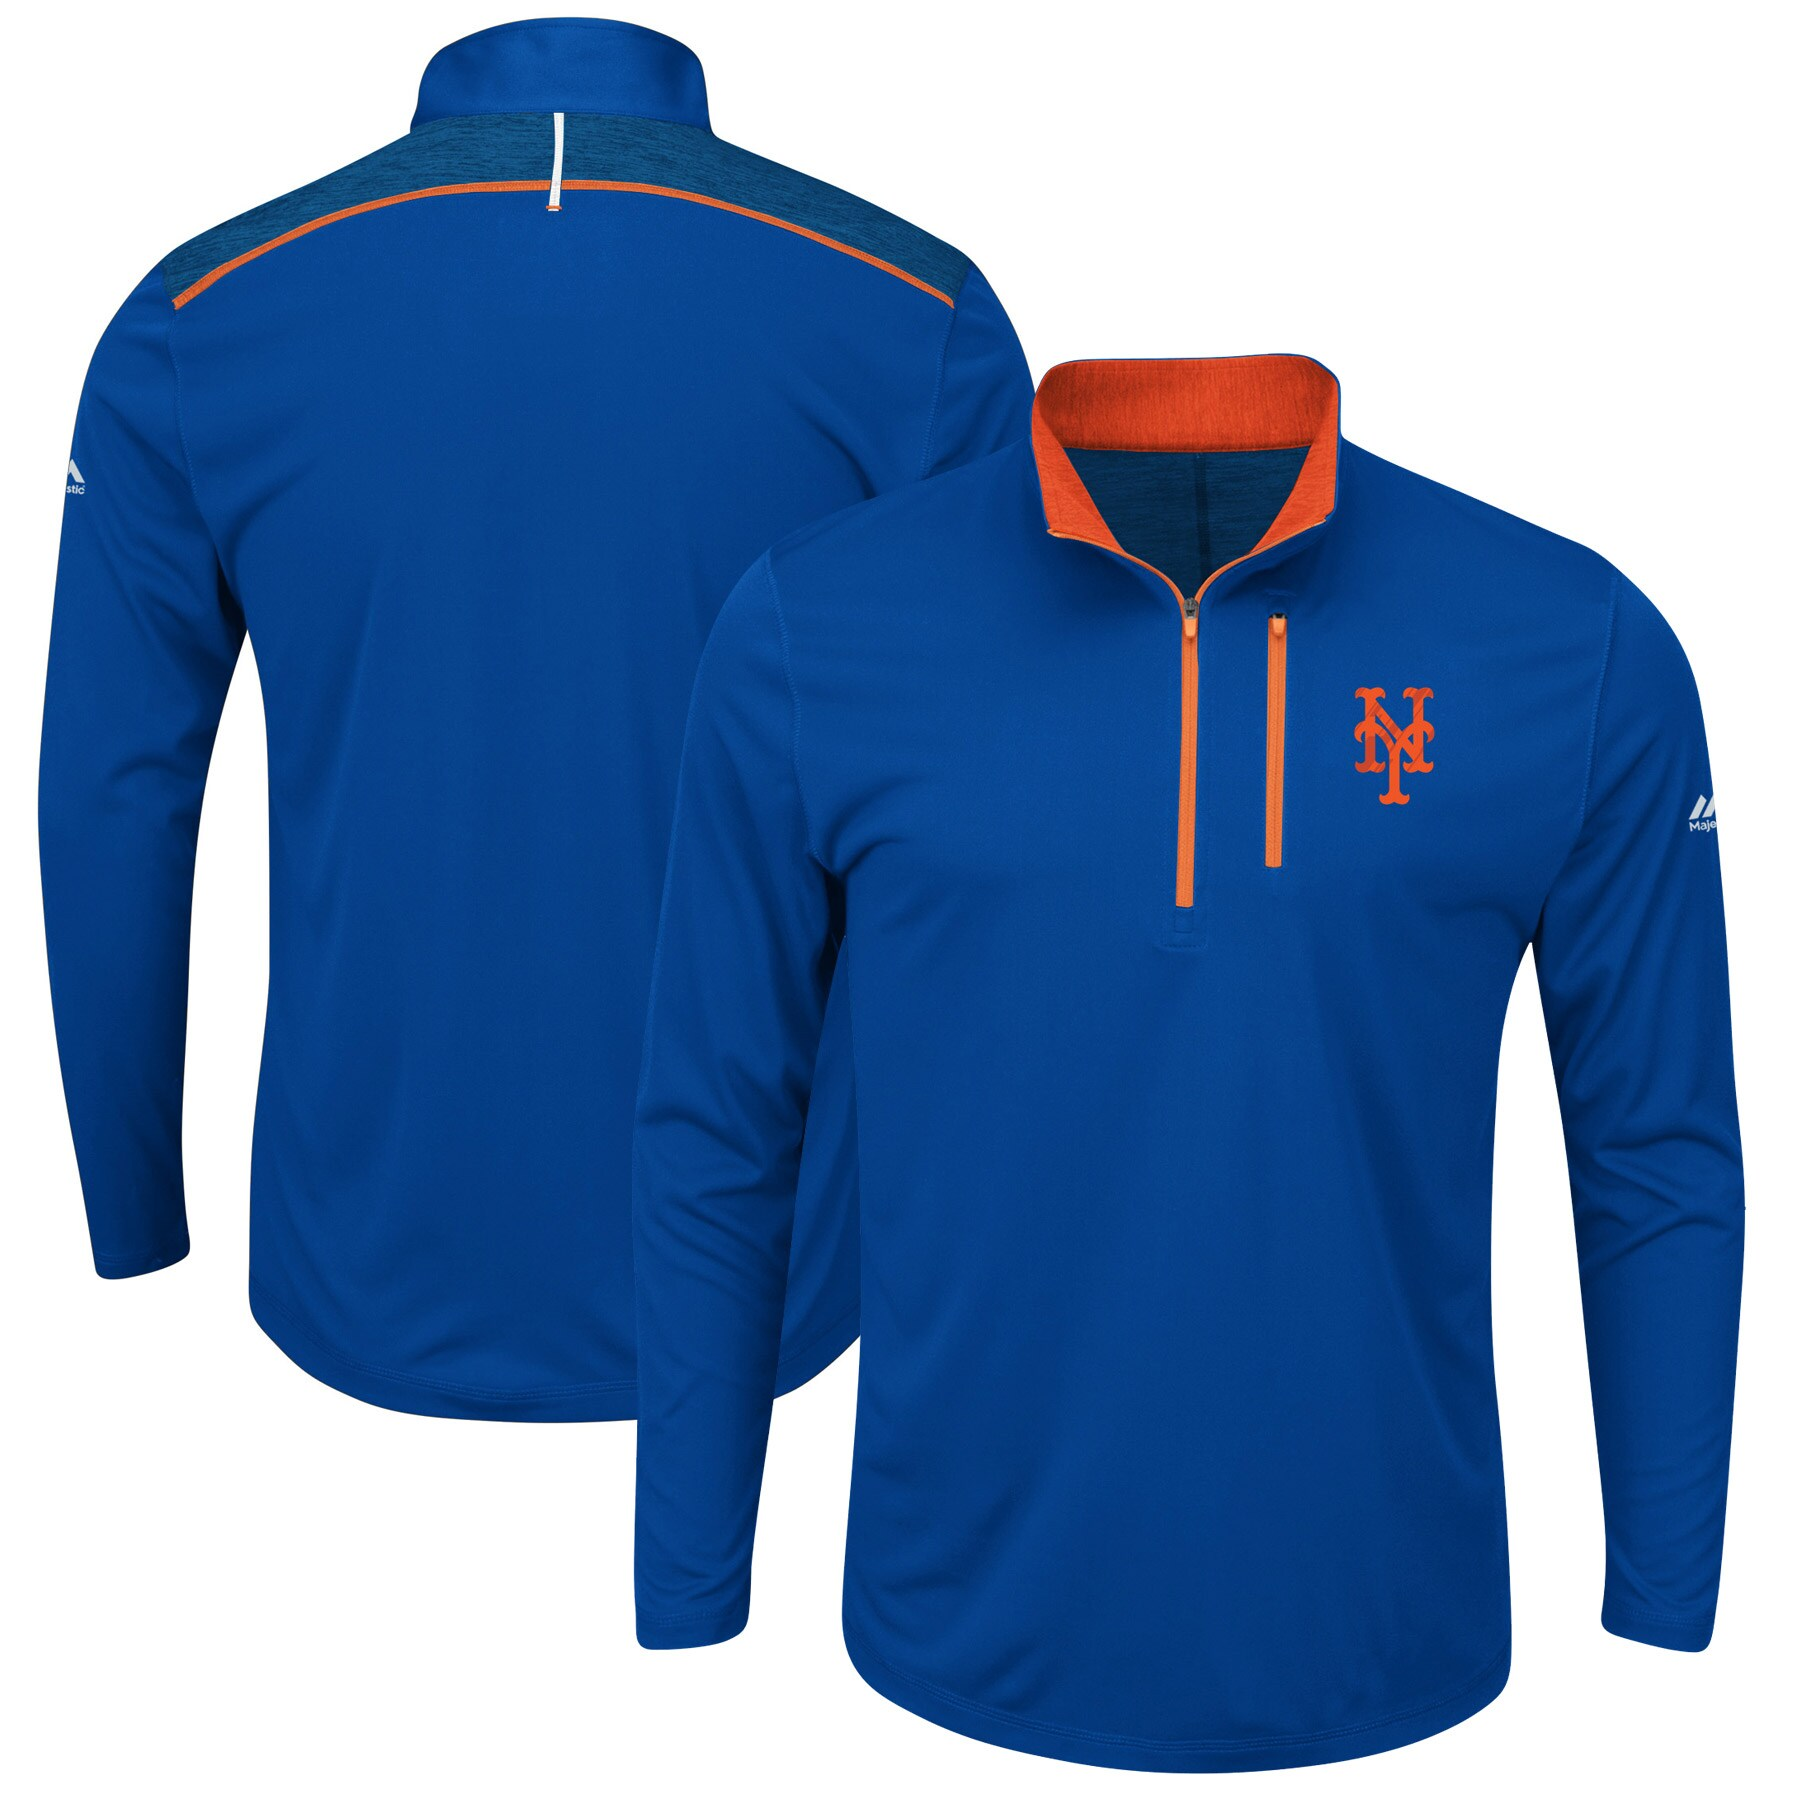 New York Mets Majestic Big & Tall 643 Half-Zip Pullover Jacket - Royal